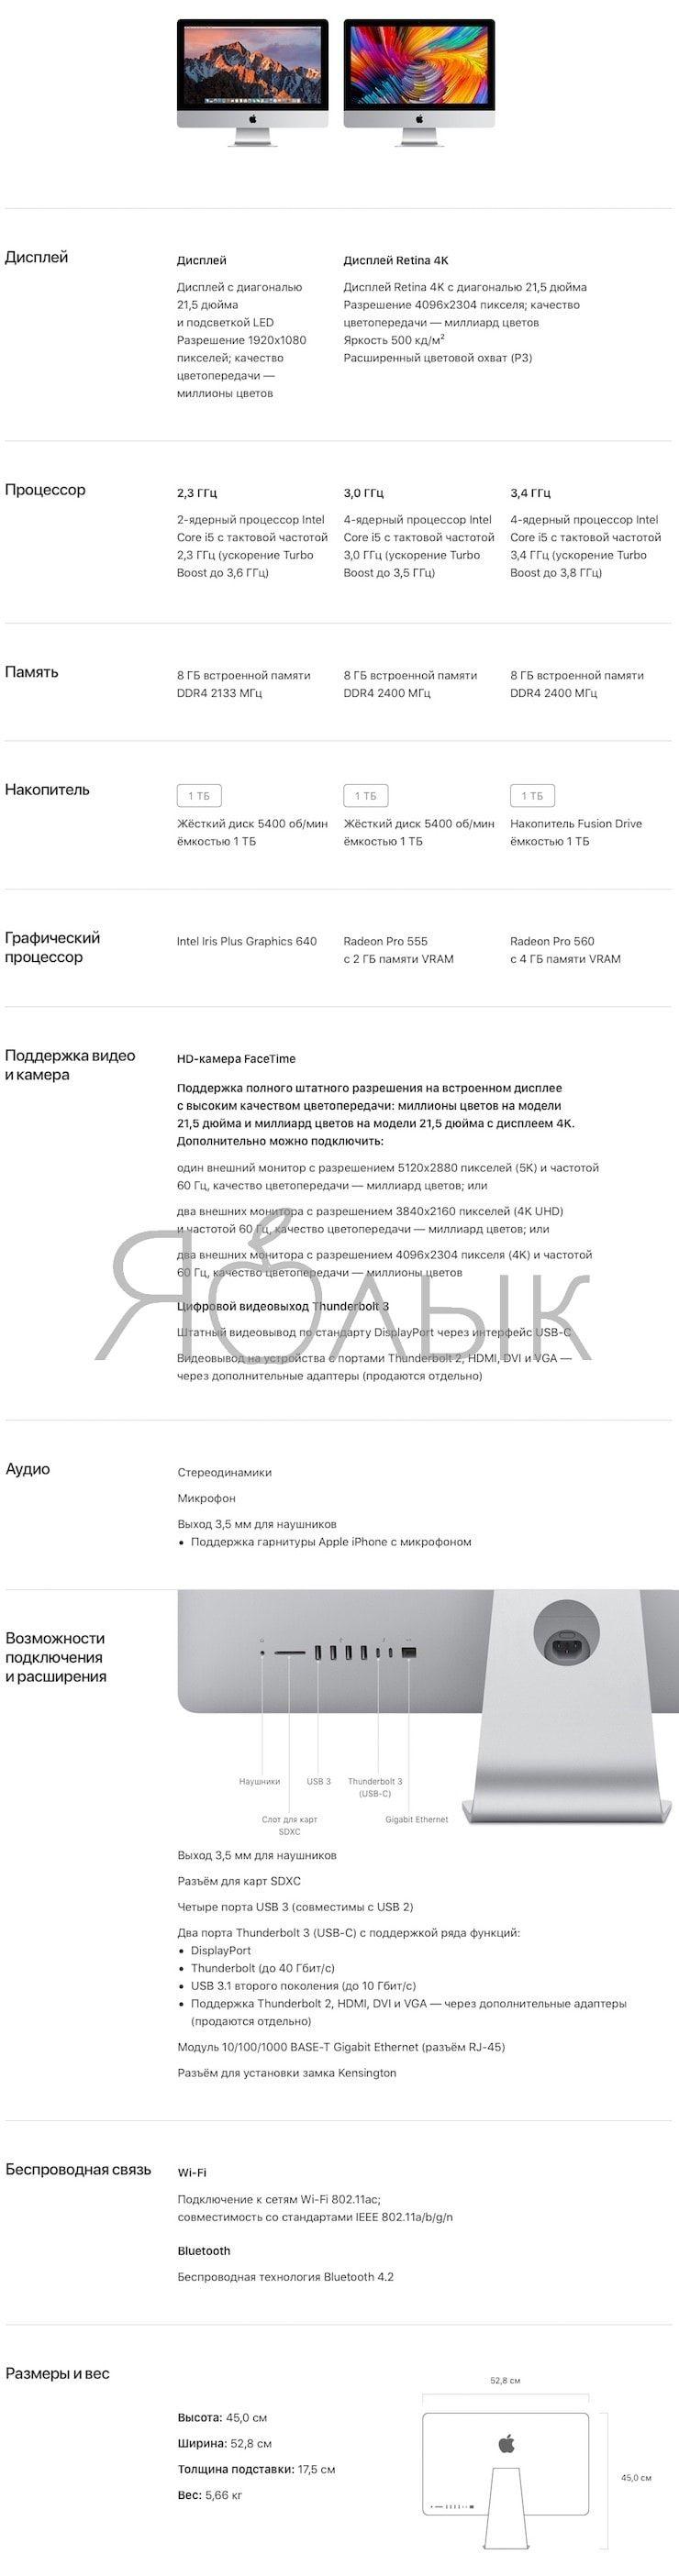 Характеристики 21,5-дюймового iMac 2017 года